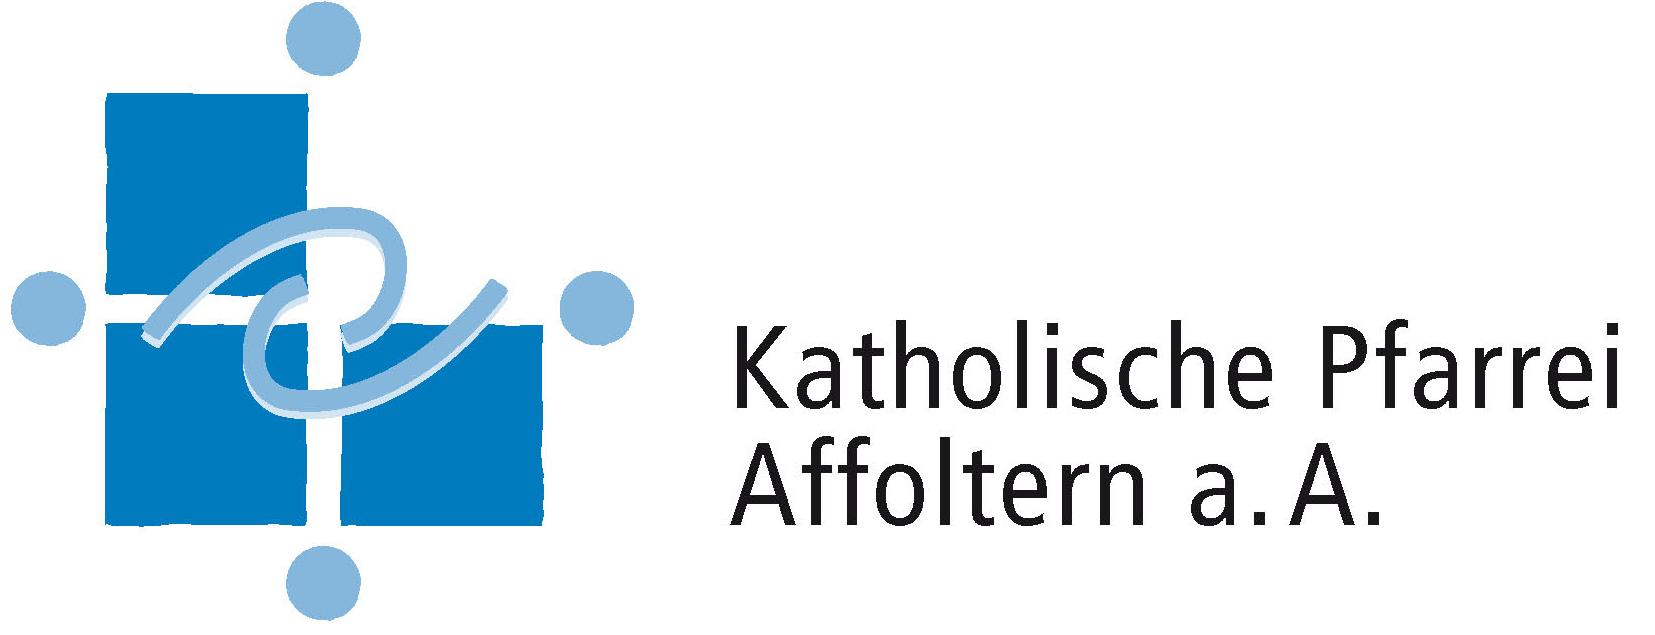 Kath. Pfarrei St. Josef & St. Antonius Affoltern a -